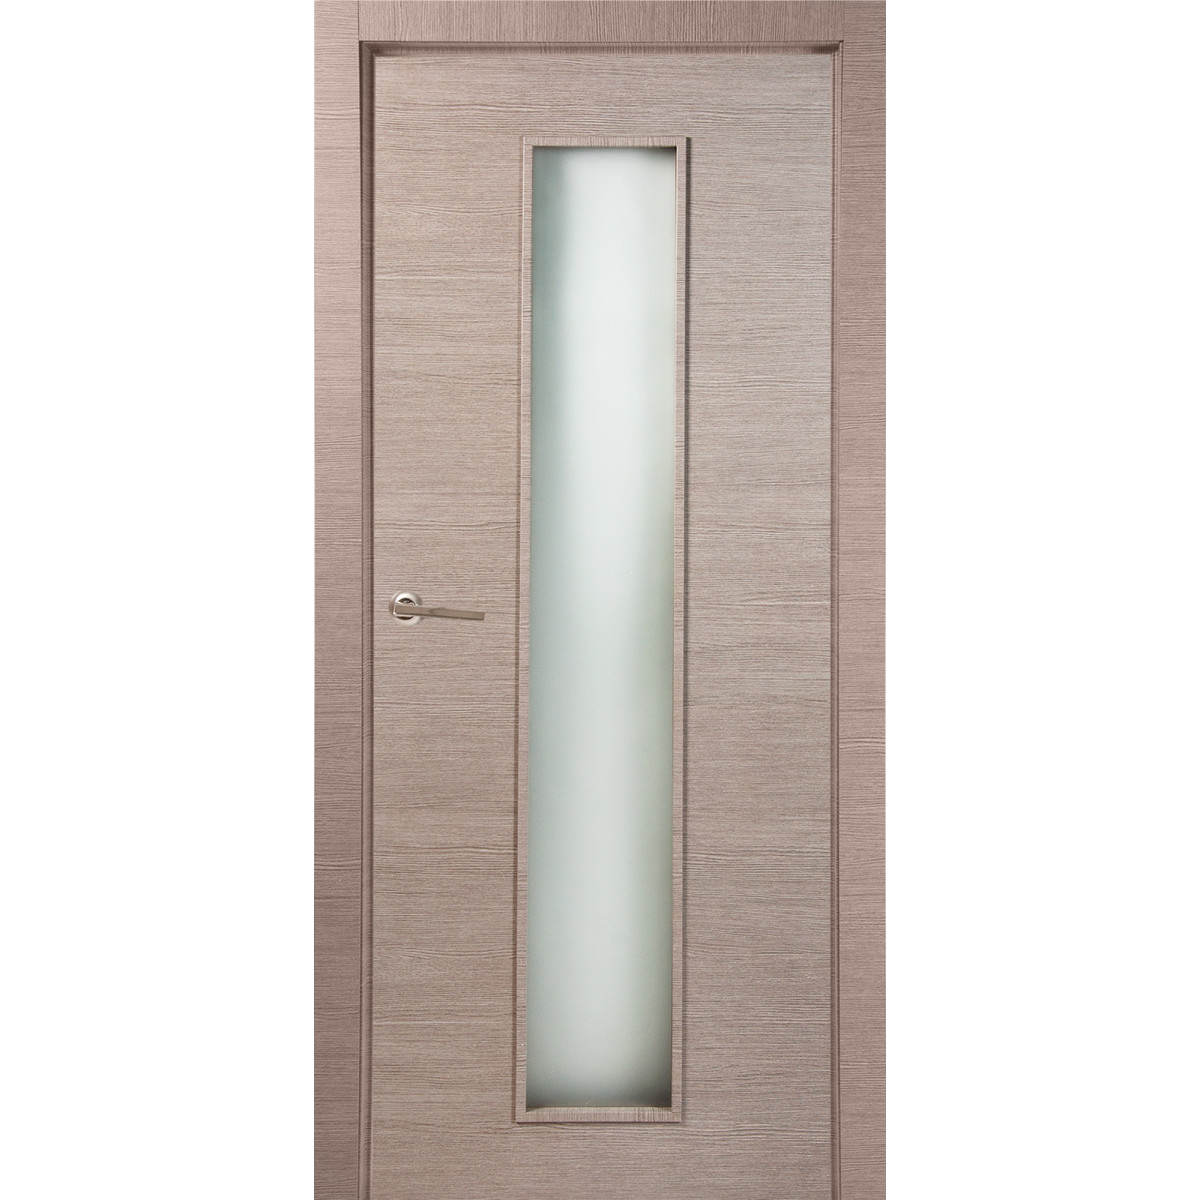 Дверь Межкомнатная Остеклённая 60x200 Ламинация Цвет Дуб Дымчатый